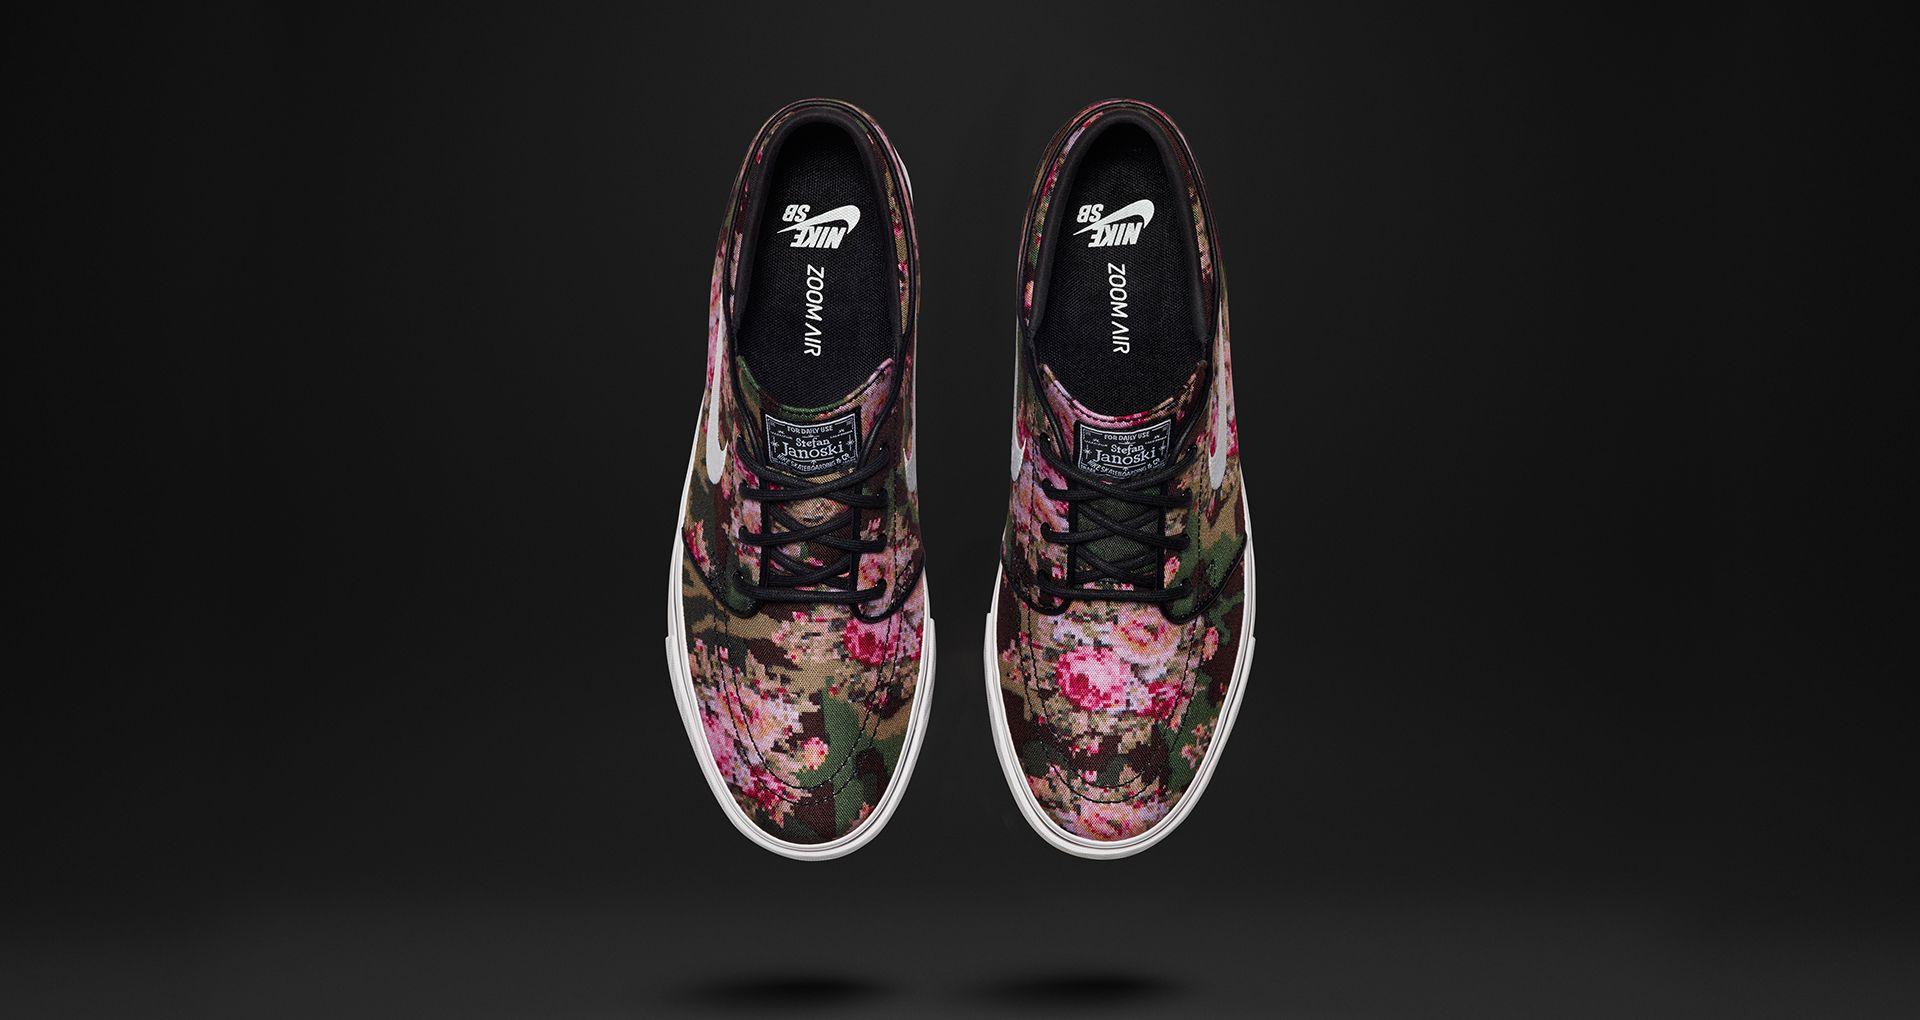 f64a16e549a8 Nike Zoom Stefan Janoski  Digi-Floral . Nike+ SNKRS